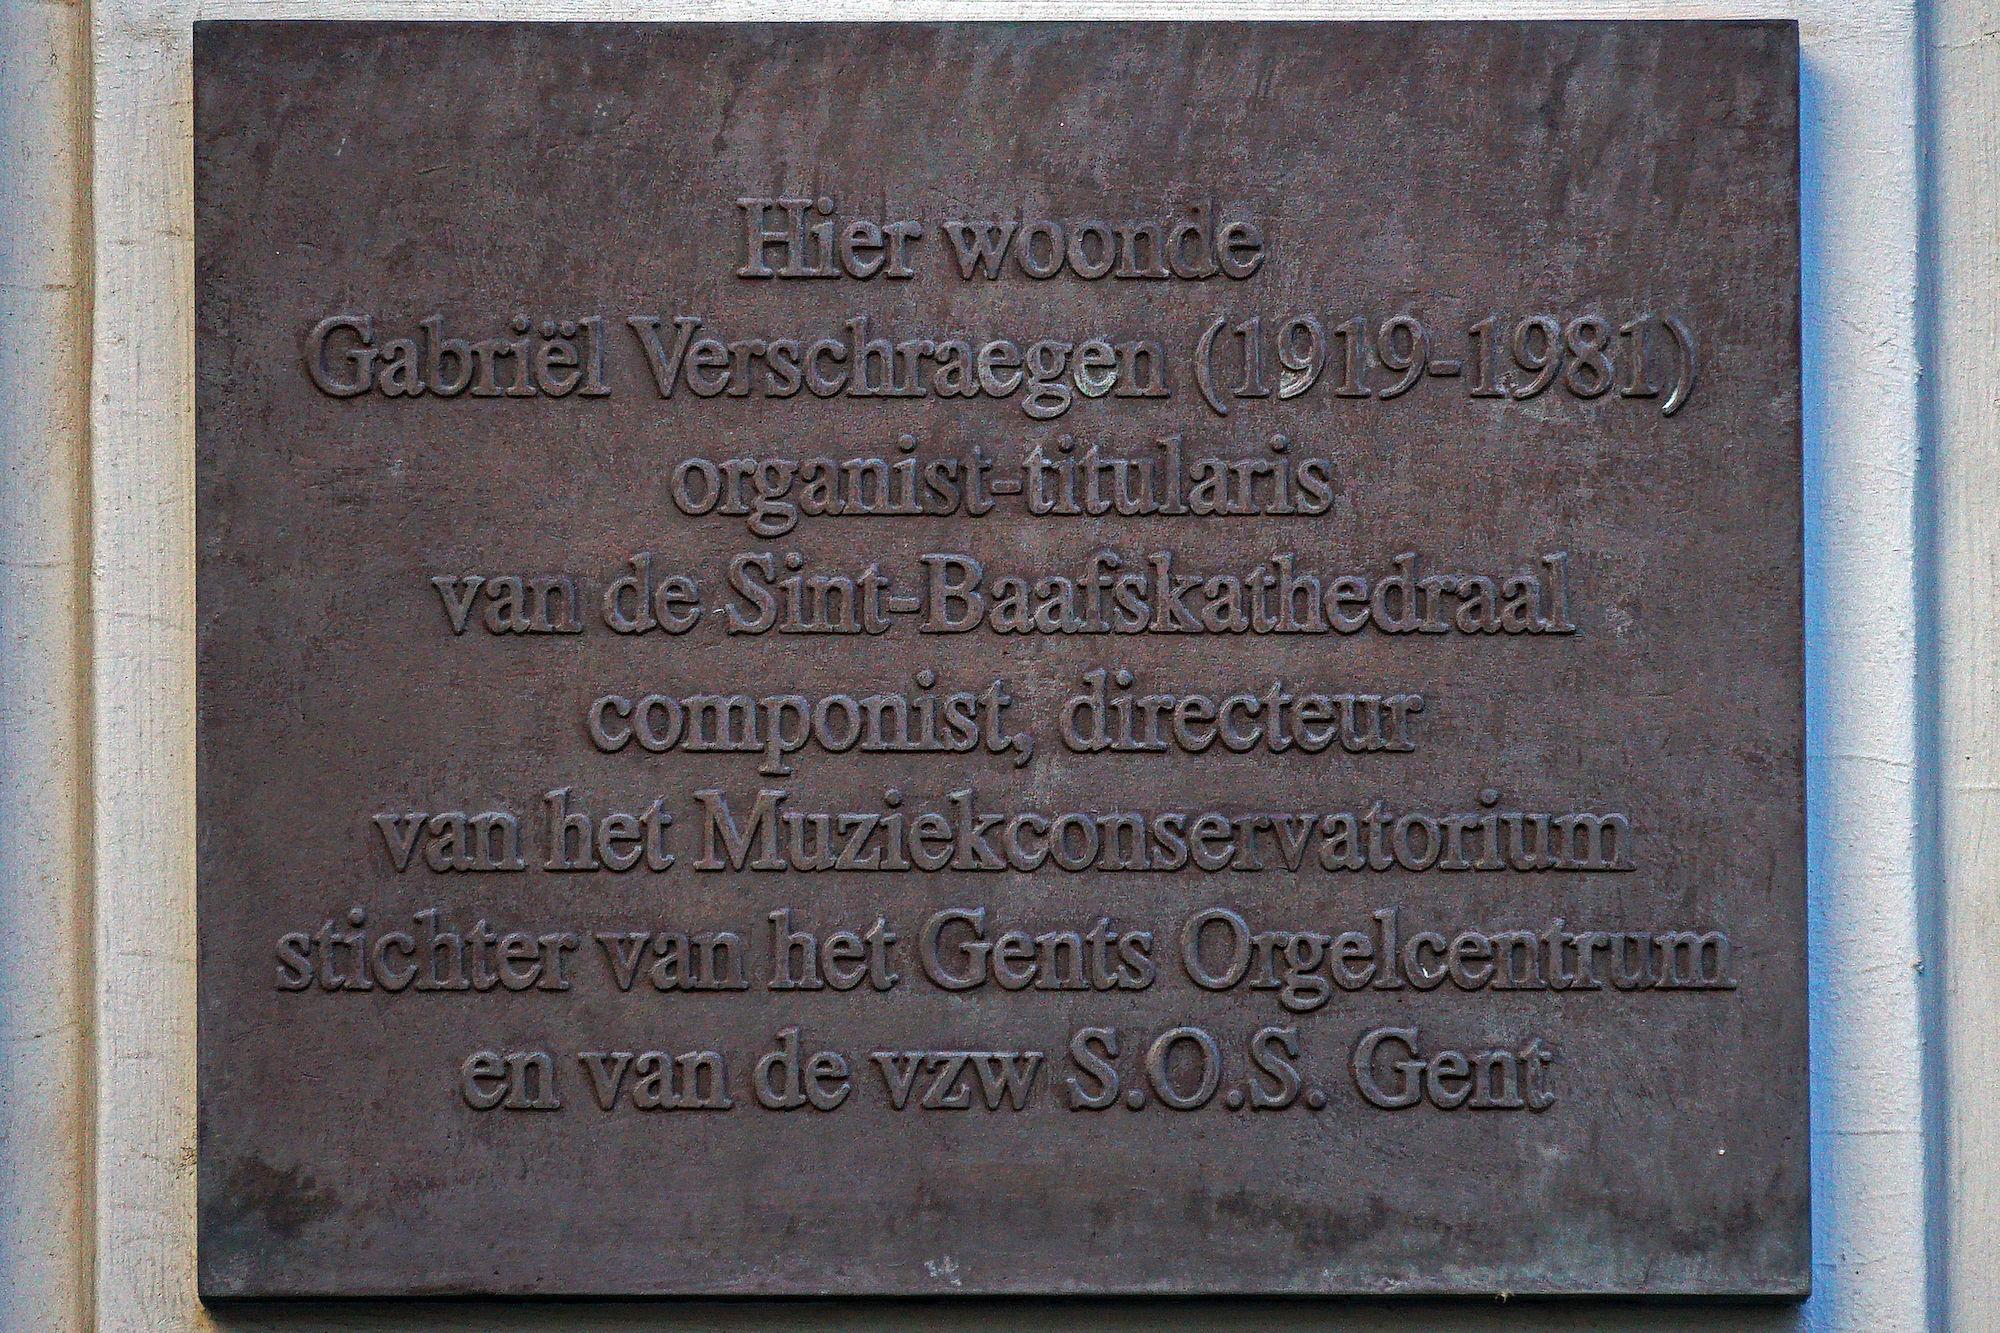 Gedenkplaat - Gabriël Verschraegen